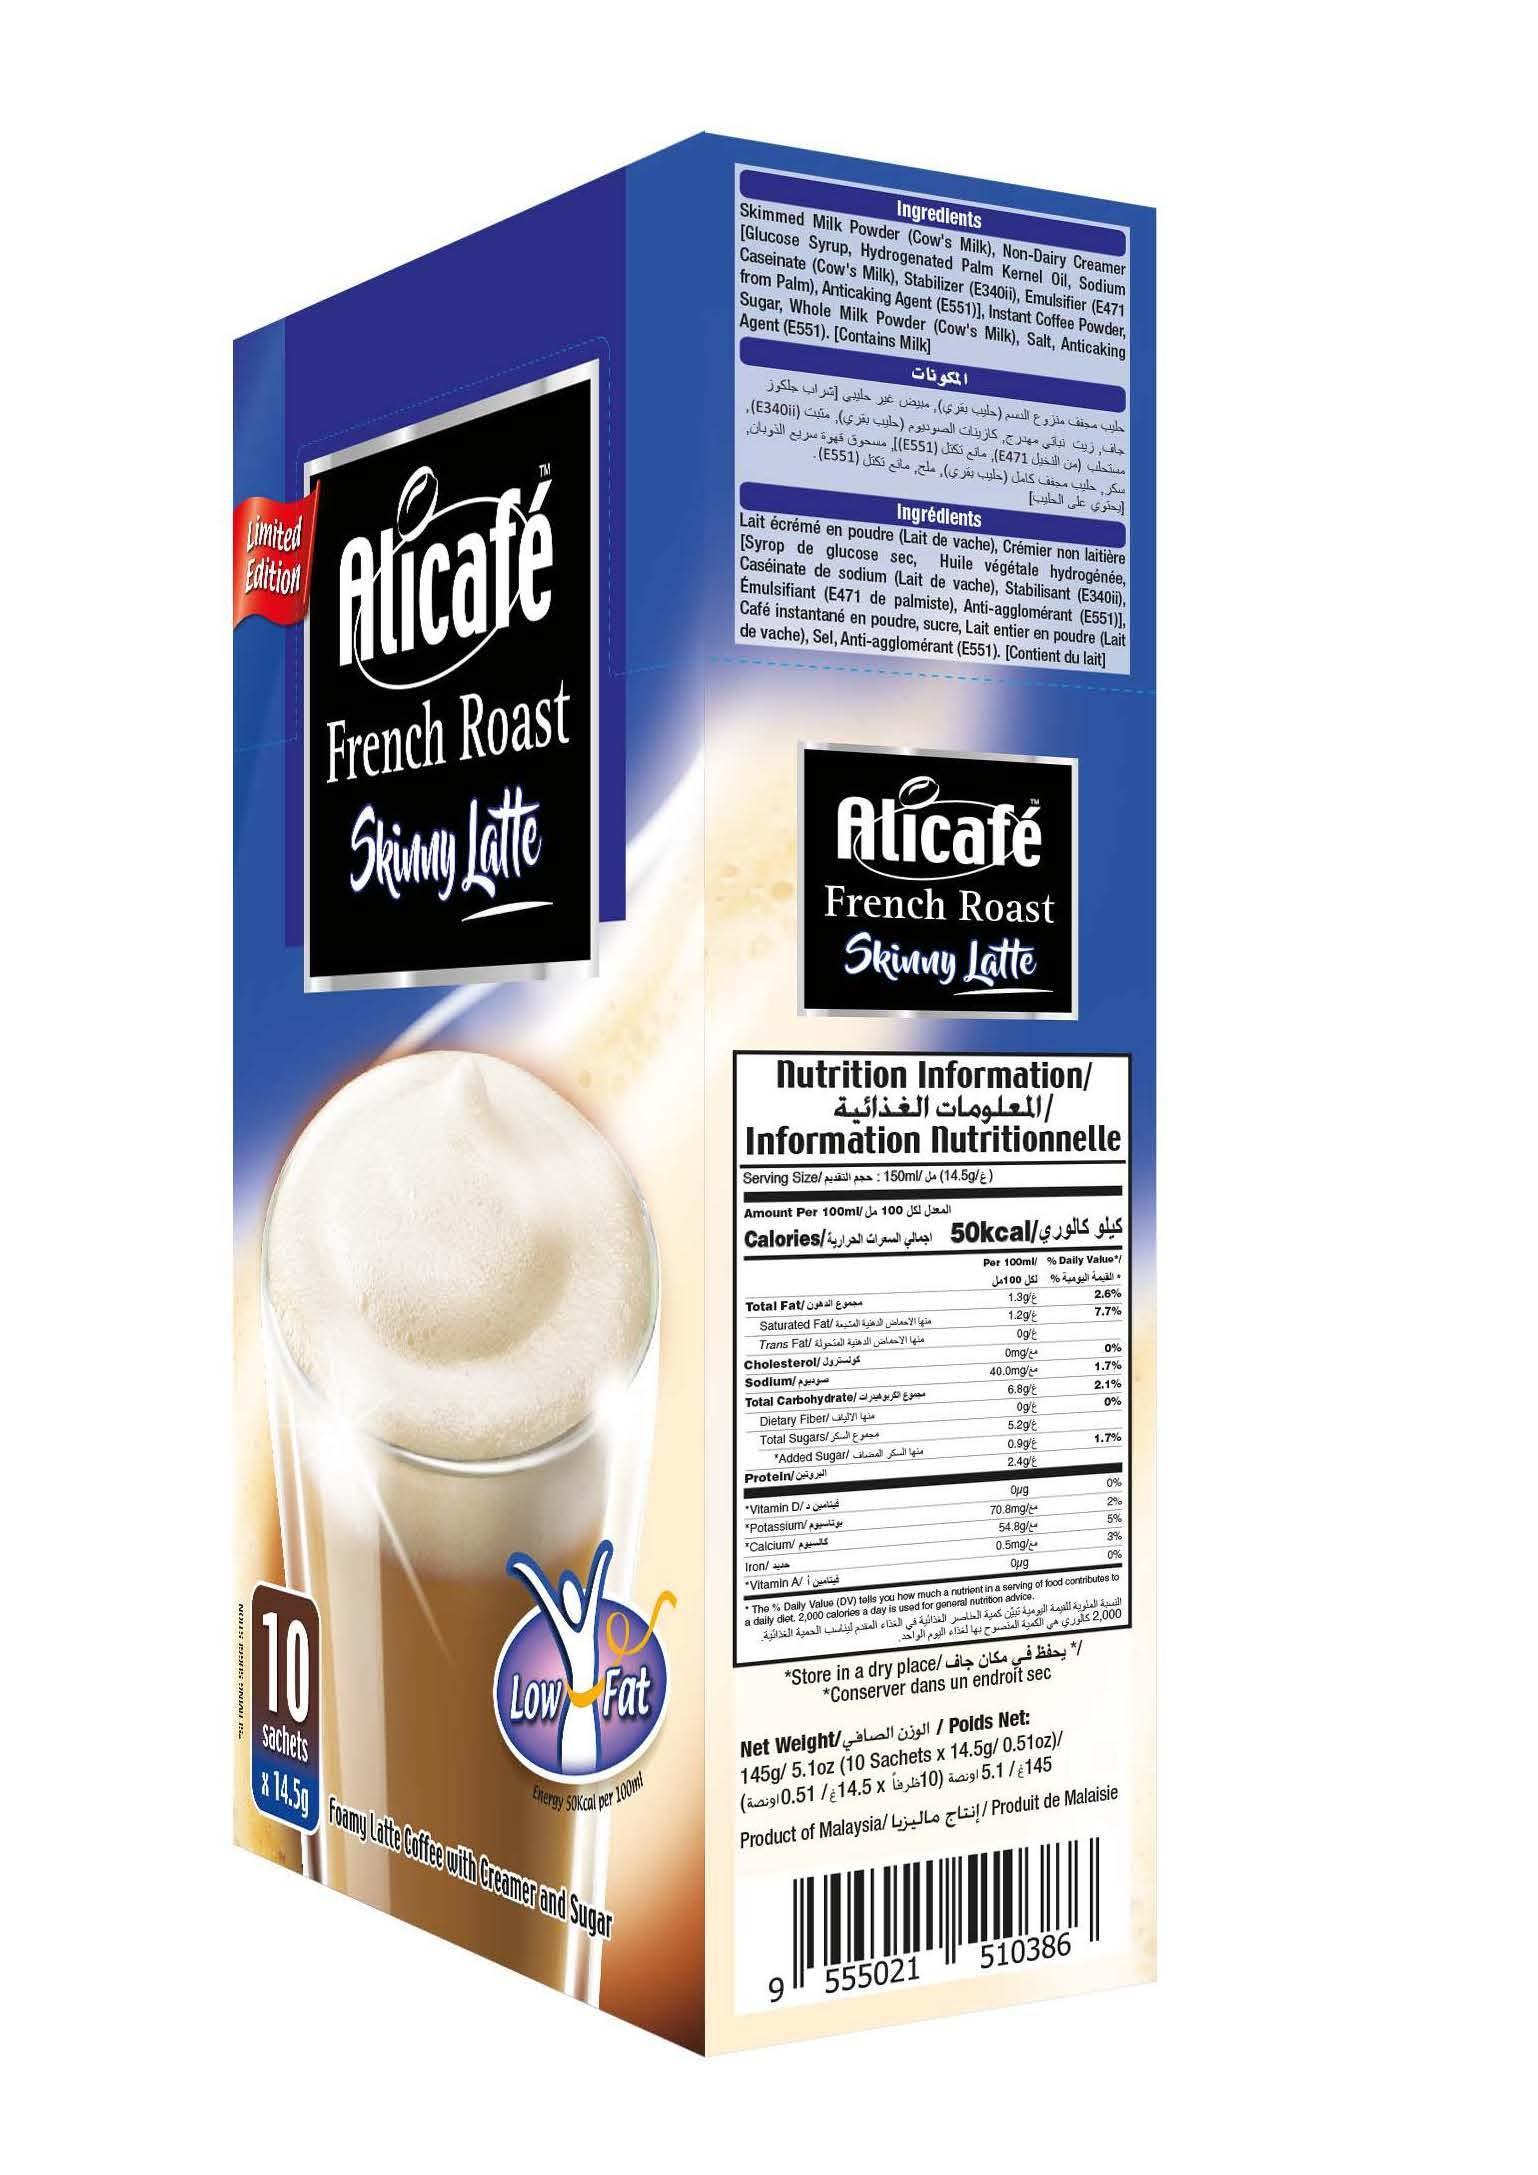 Alicafé French Roast Skinny Latte